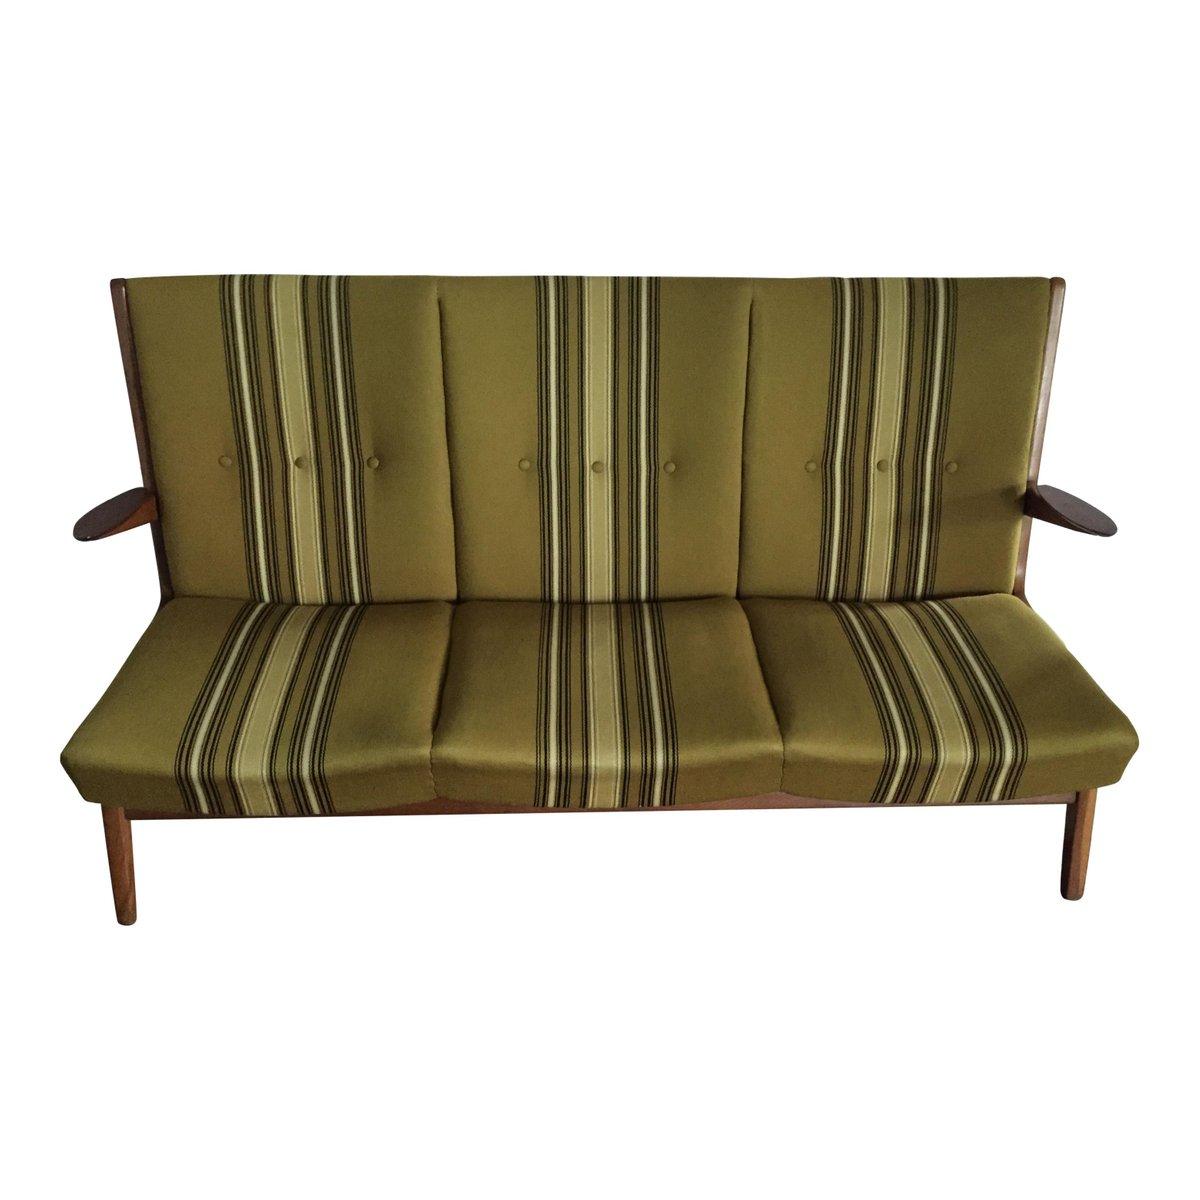 canap scandinave en teck 1960s en vente sur pamono. Black Bedroom Furniture Sets. Home Design Ideas